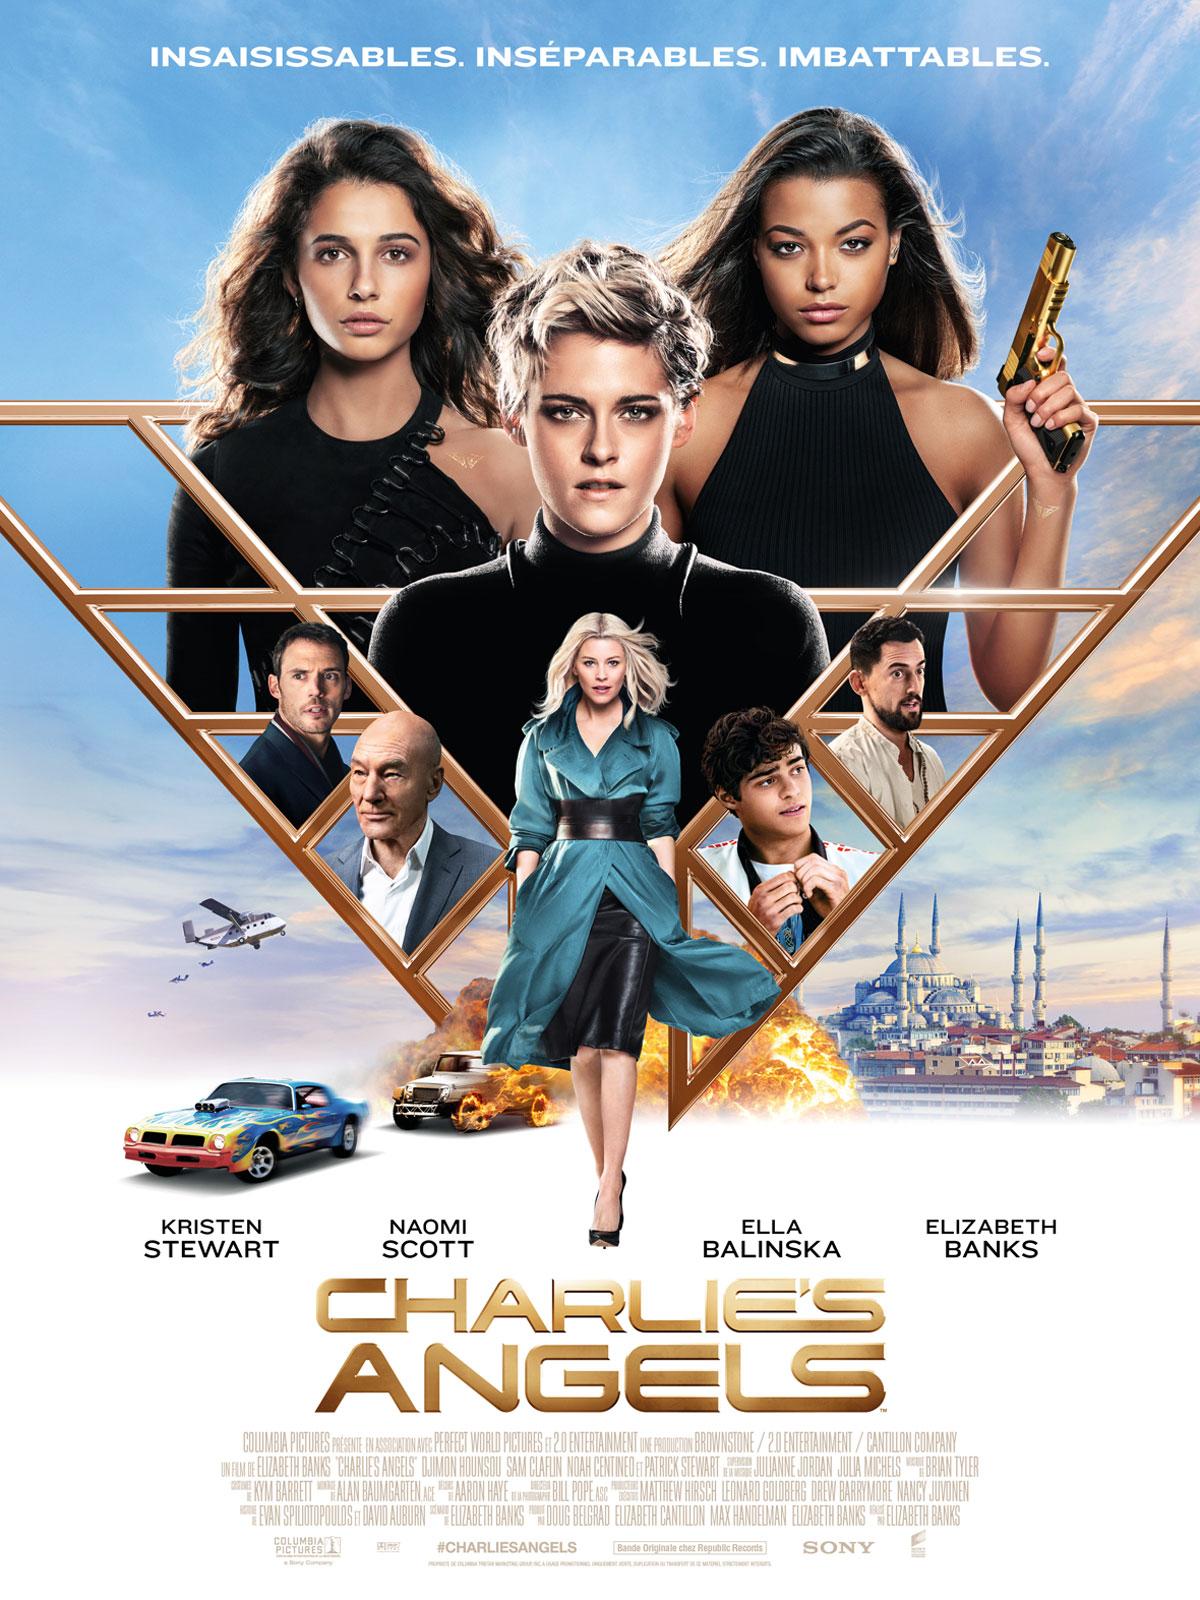 AfficheCharlie's Angels